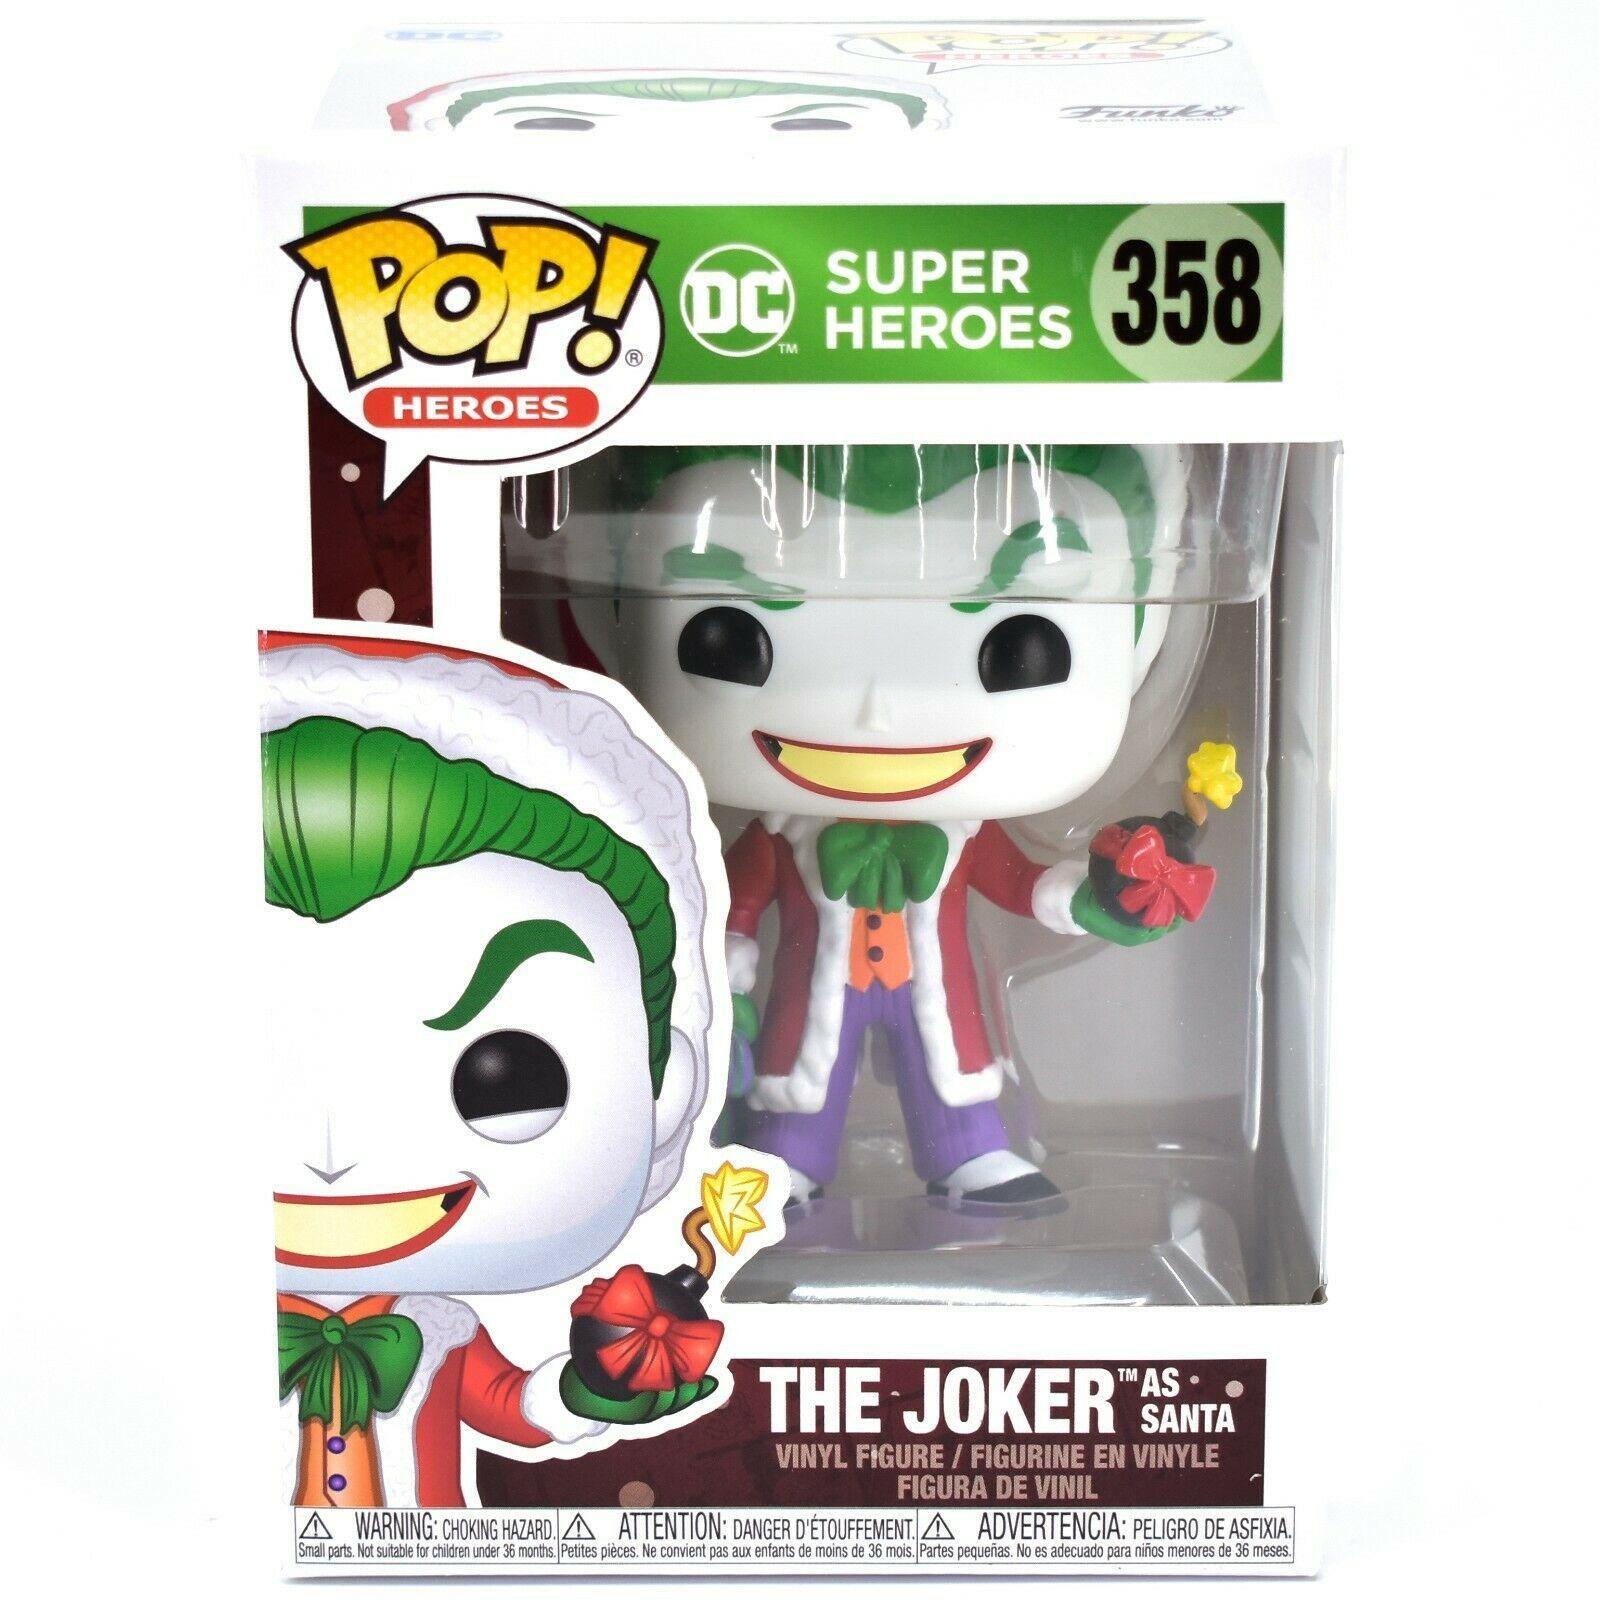 Funko Pop! DC Super Heroes Joker as Santa #35 Christmas Holiday Vinyl Figure